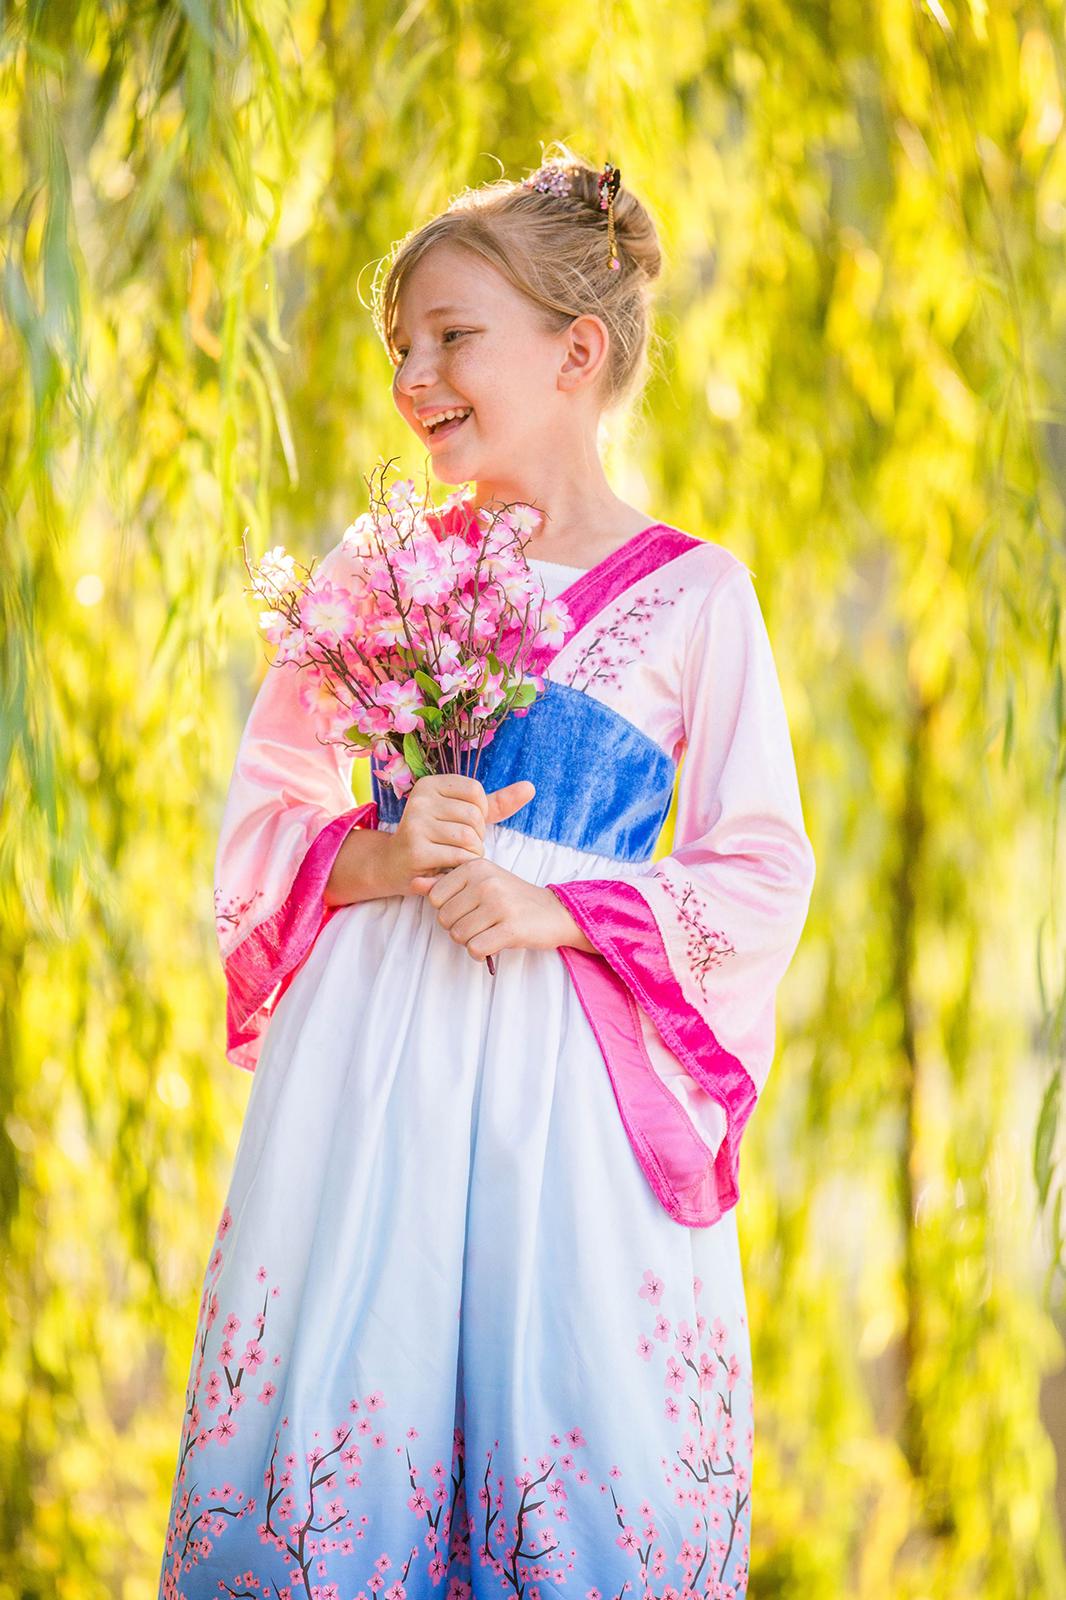 Mulan Replica Dress